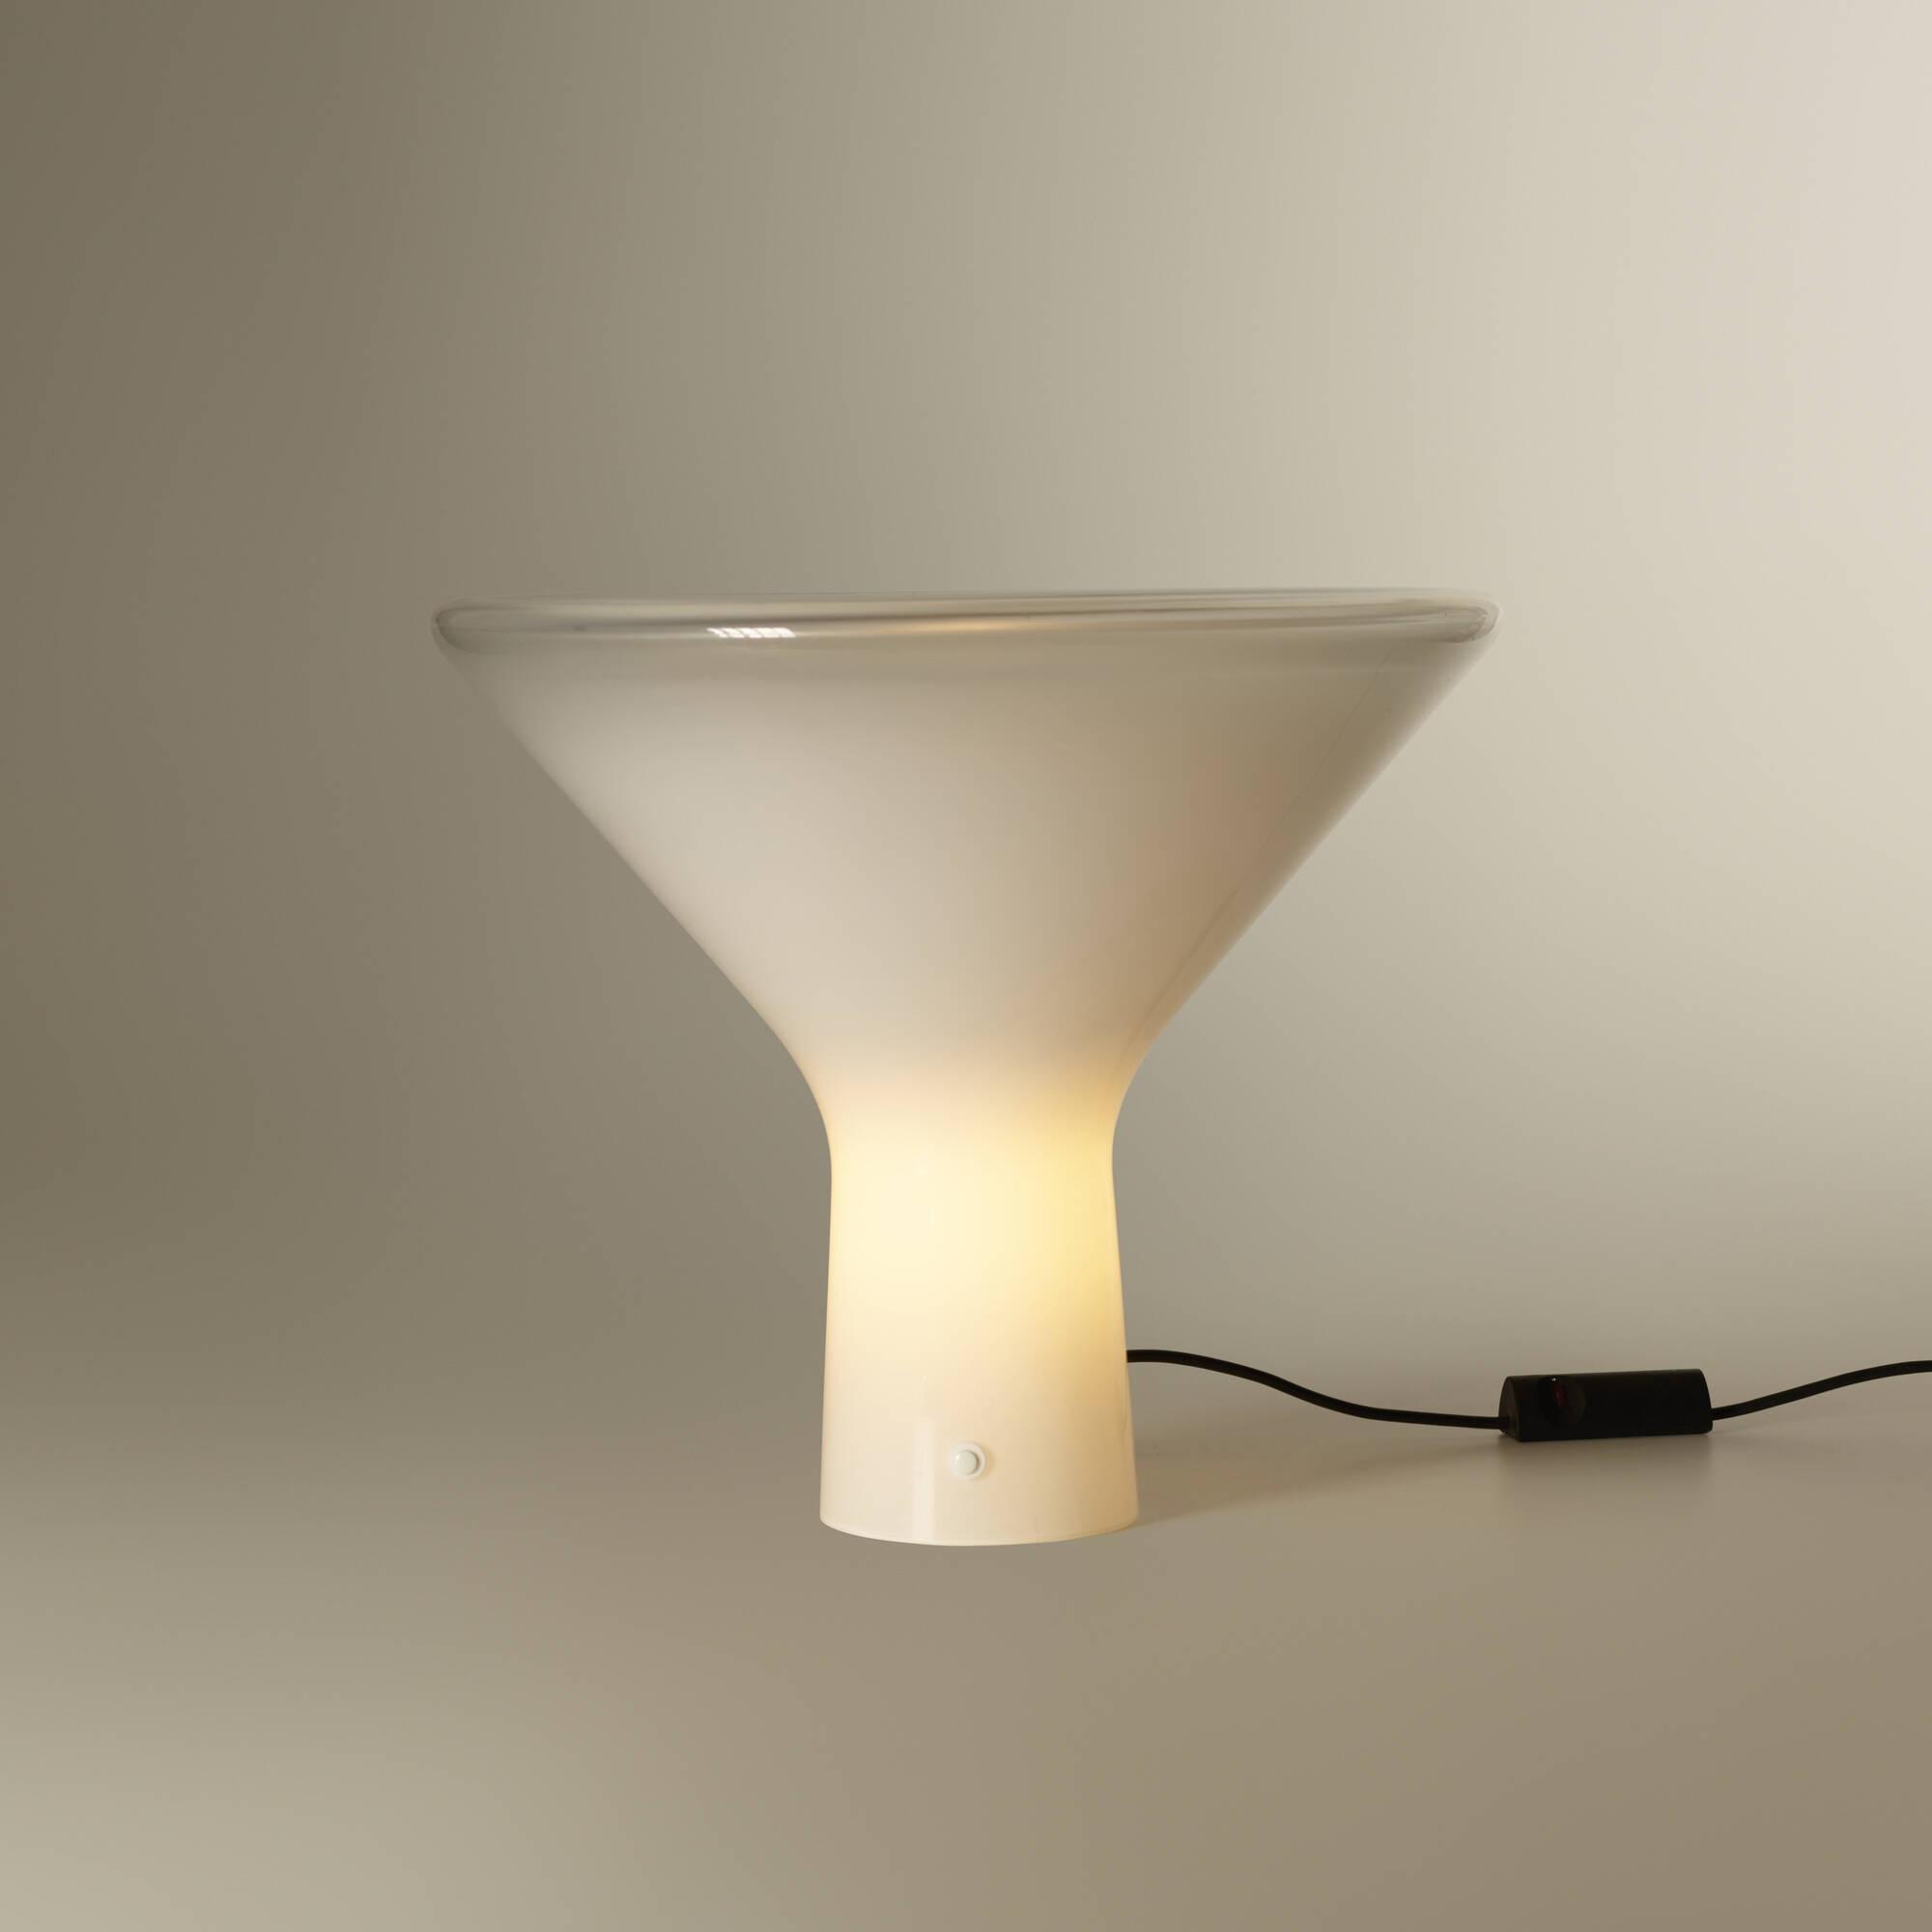 524: Angelo Mangiarotti / table lamp (2 of 2)